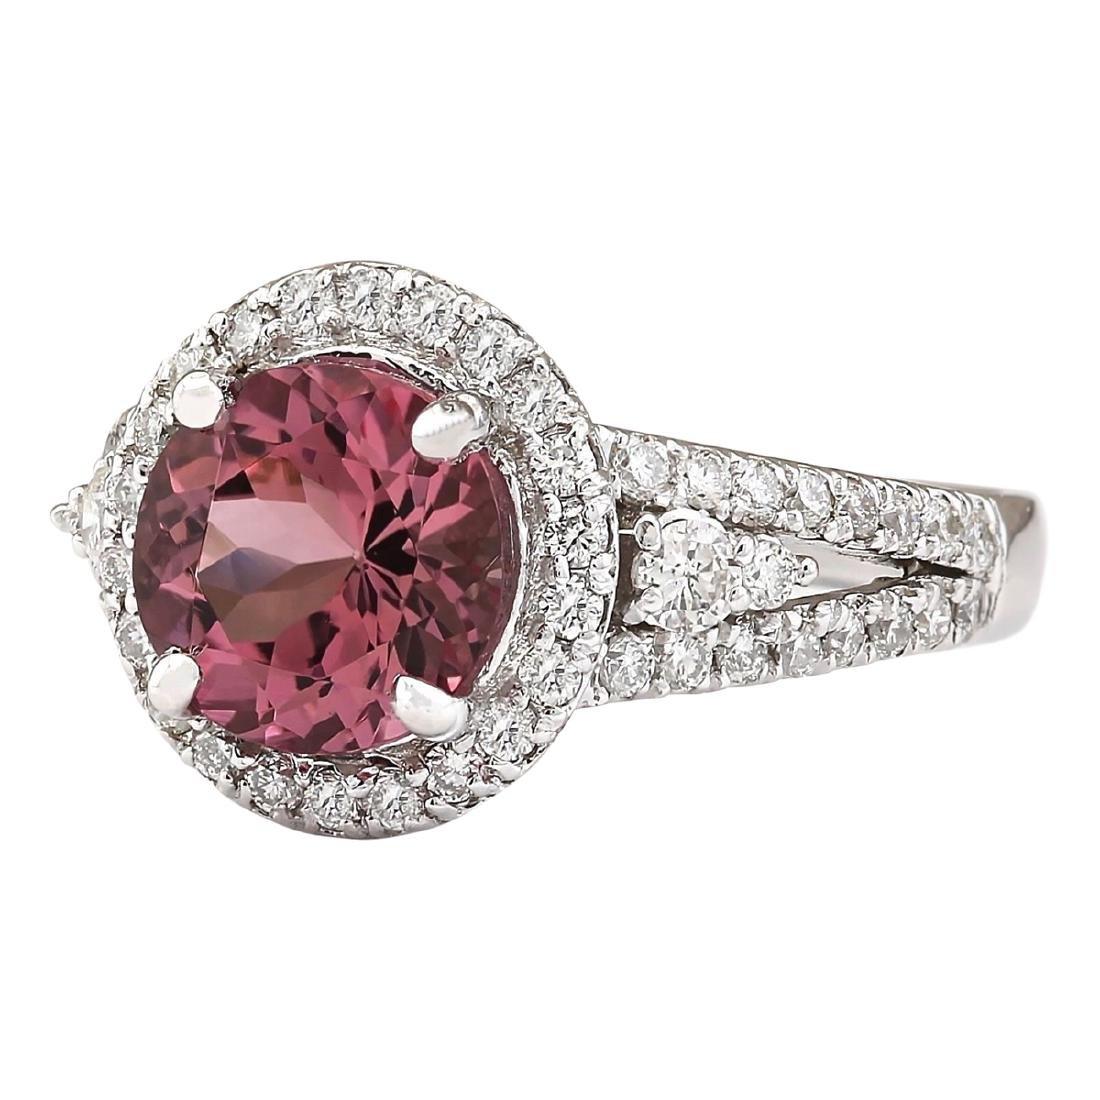 2.79 CTW Natural Pink Tourmaline And Diamond Ring 18K - 2